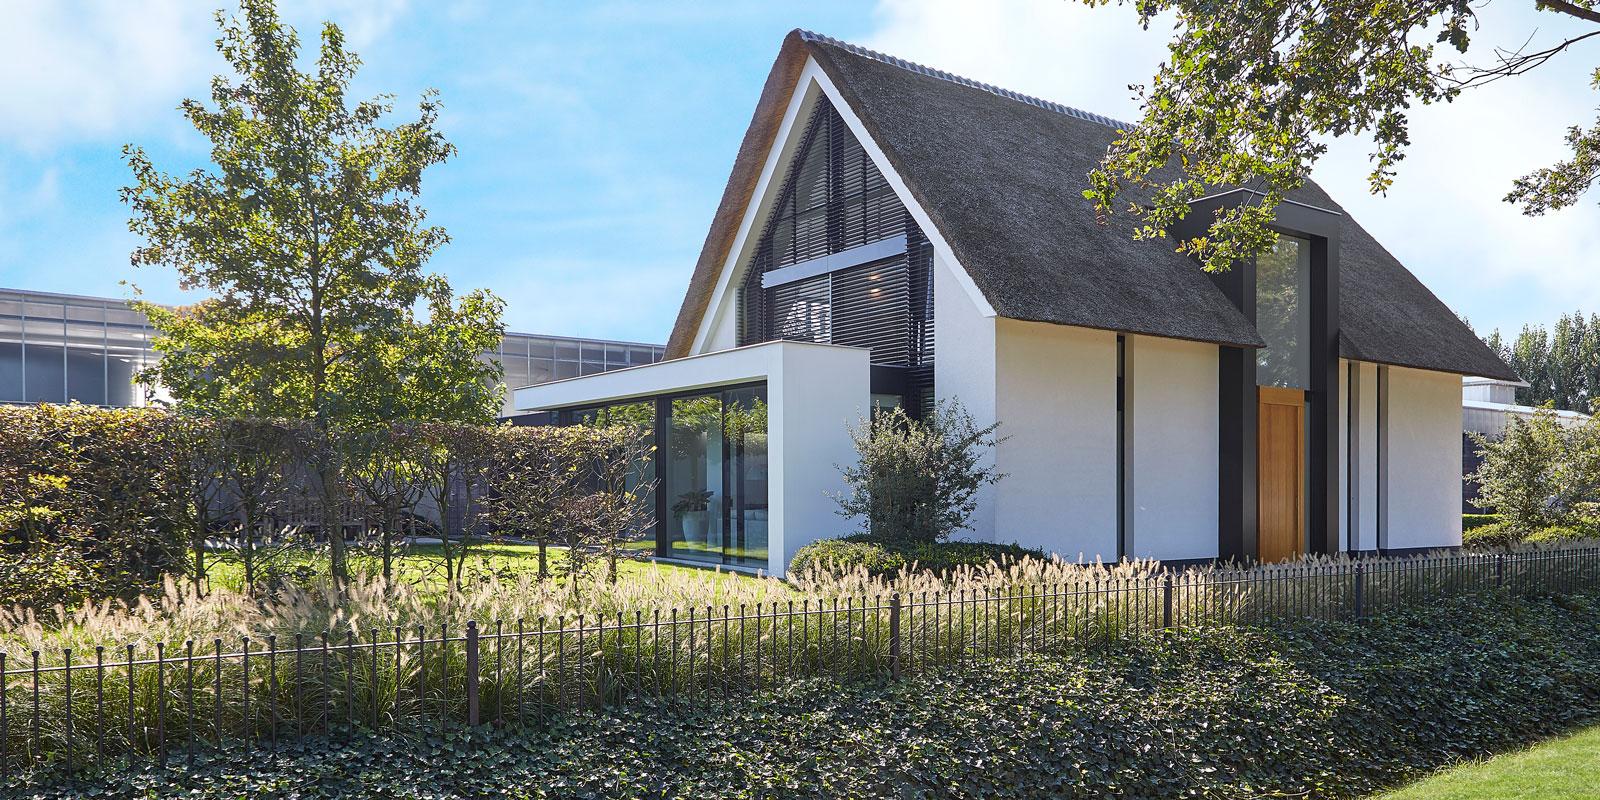 Modern Landelijk, LEN Architectuur, the art of living